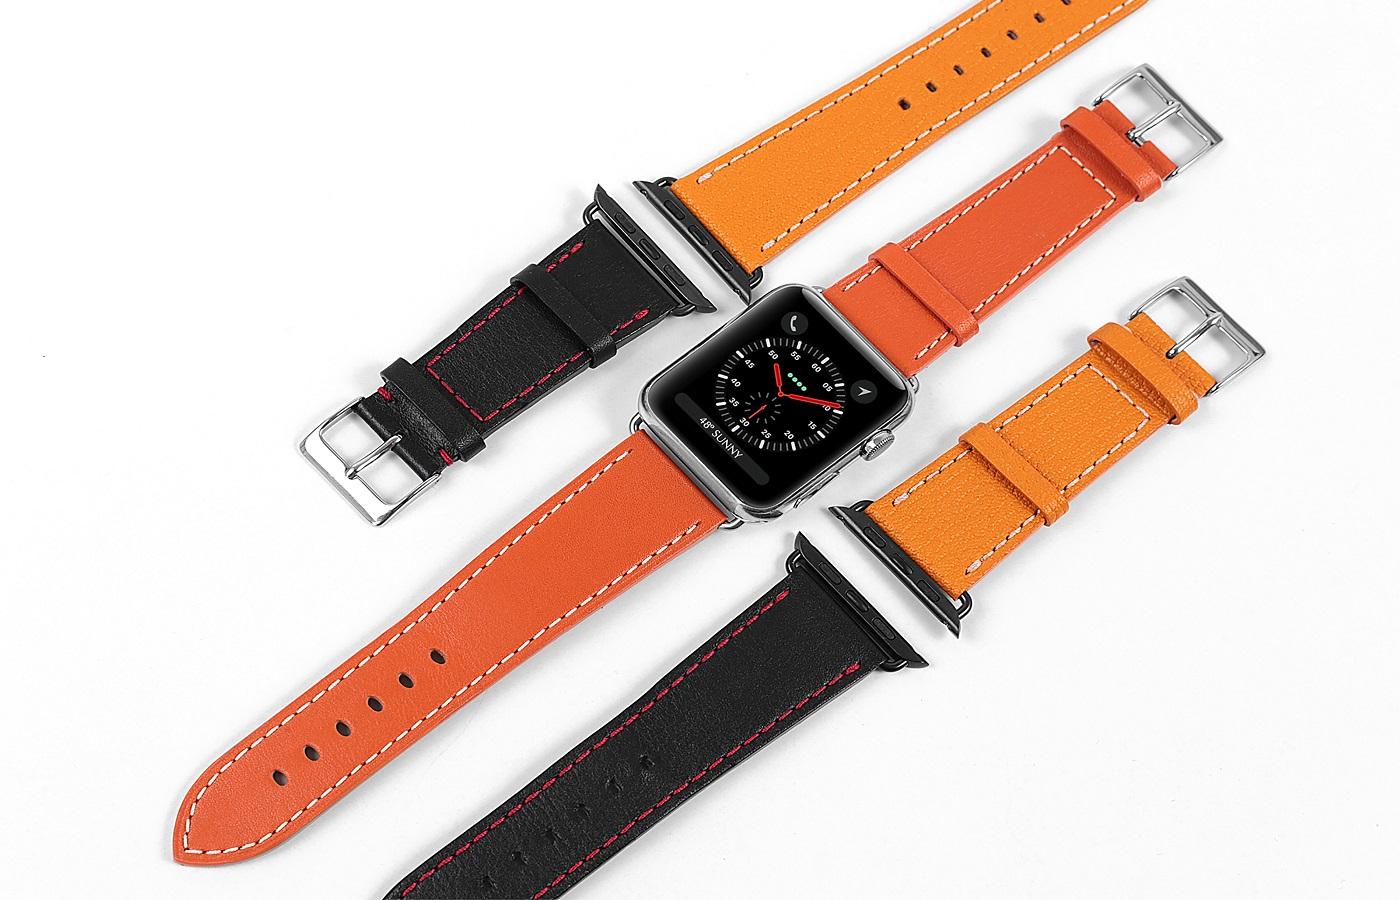 lederaccessoire uhrenarmbänder applewatch orange